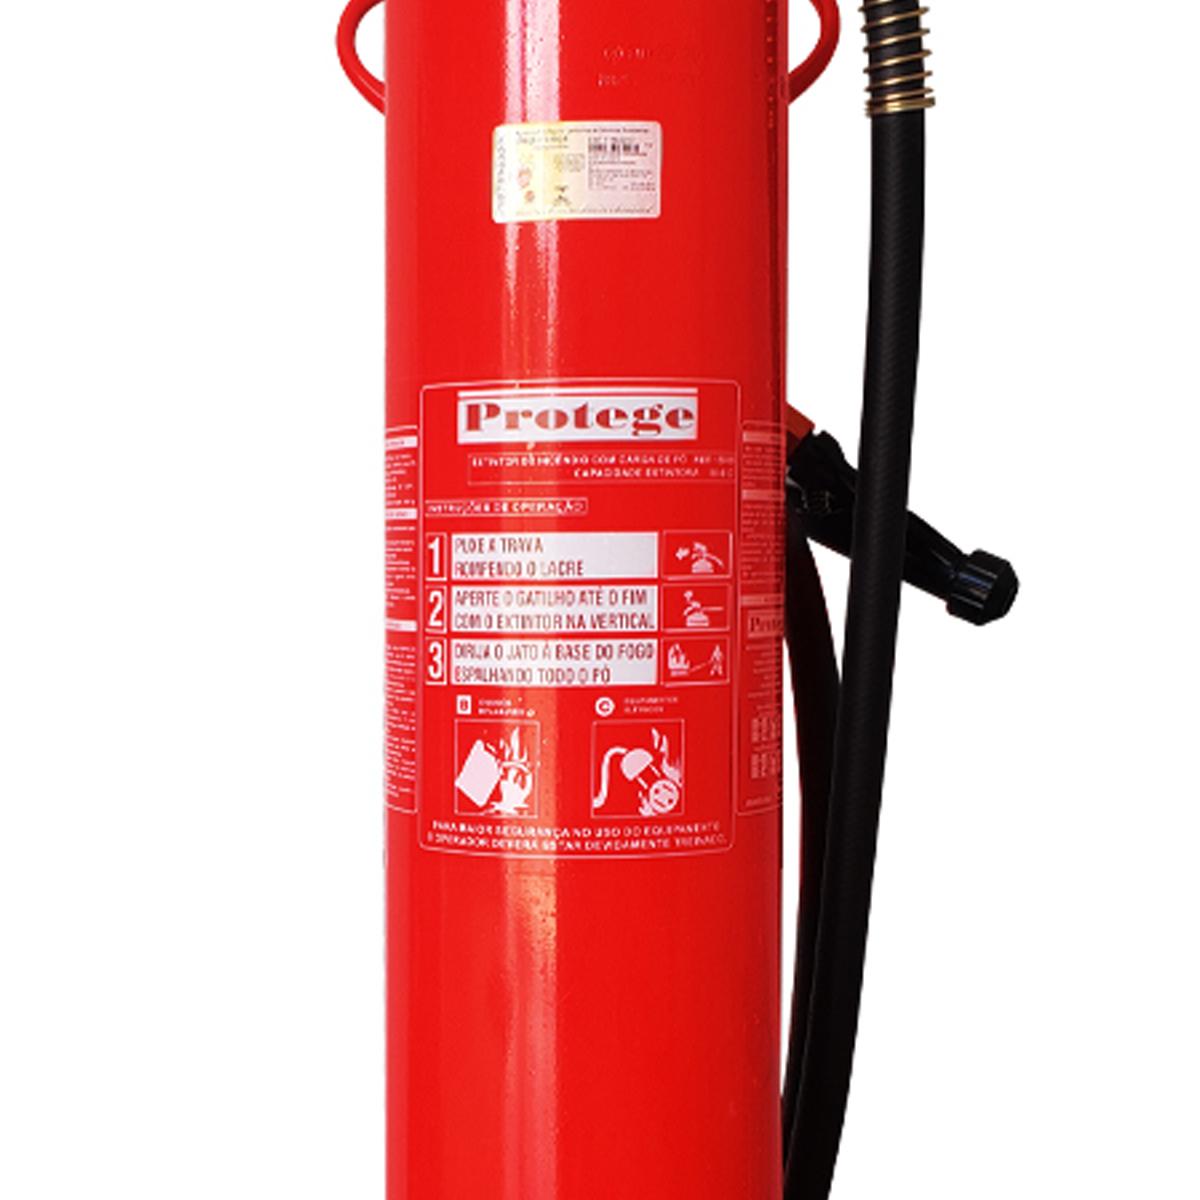 Extintor Pó Químico 80-BC de 20Kg tipo Carreta Sobre Rodas